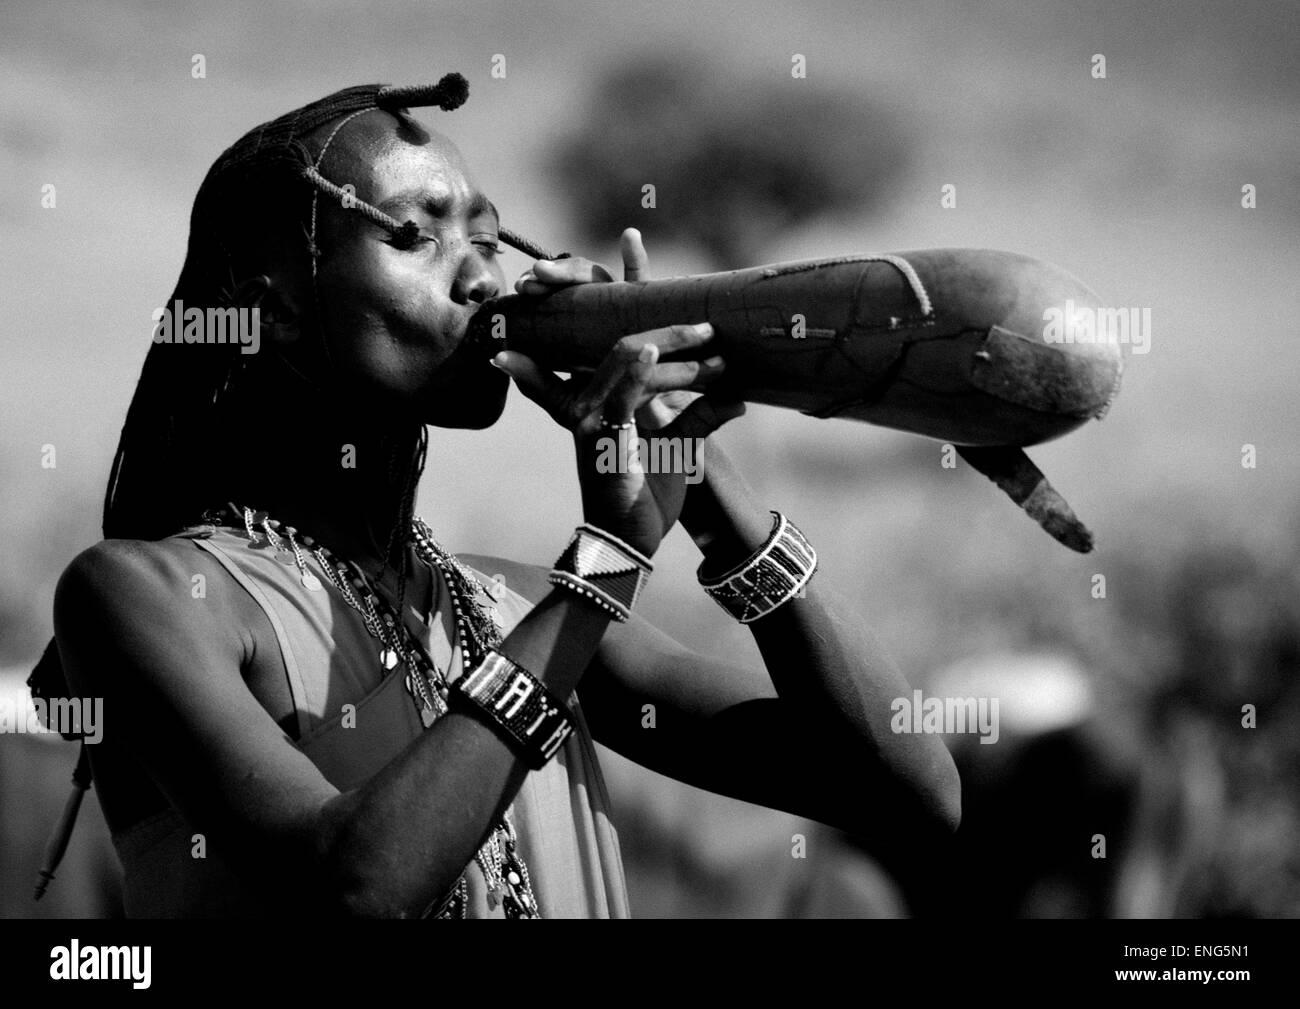 Maasai Warrior Drinking Cow Blood In A Calabash, Nakuru County, Nakuru, Kenya - Stock Image